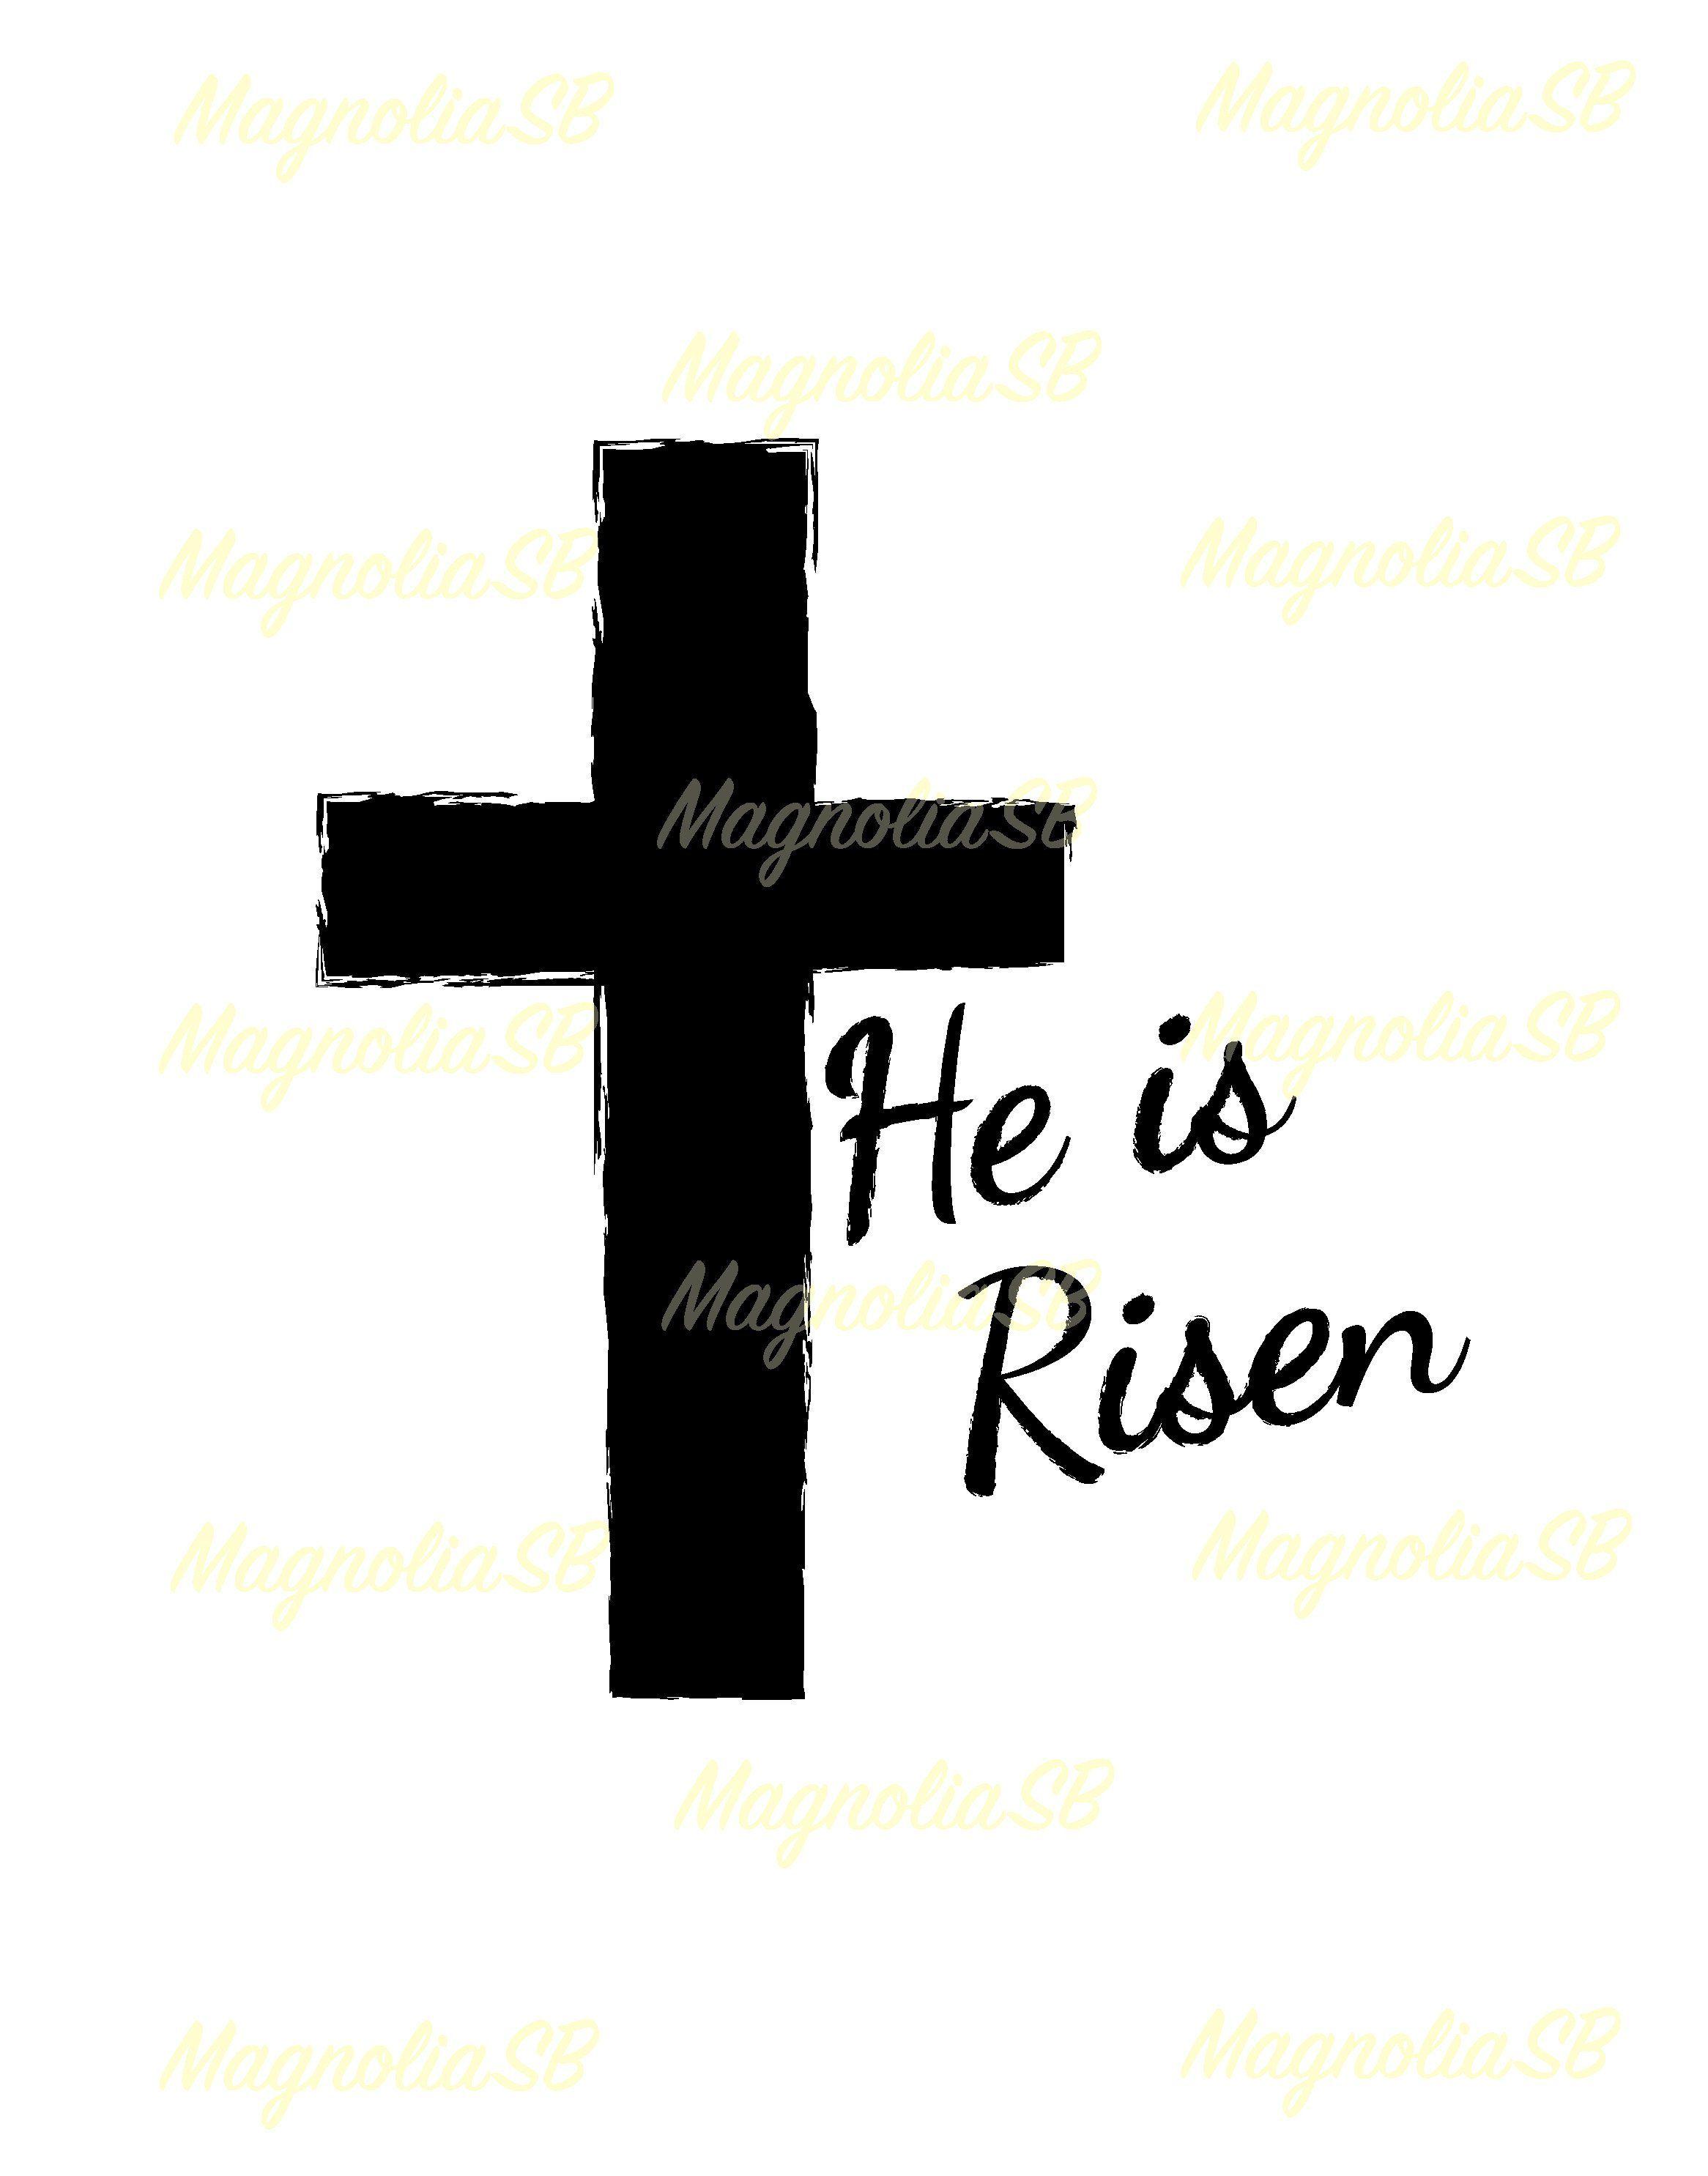 he is risen svg he is risen dxf he is risen clipart cutting easter he is risen vector he is risen shape he is risen silhouette [ 2332 x 2971 Pixel ]